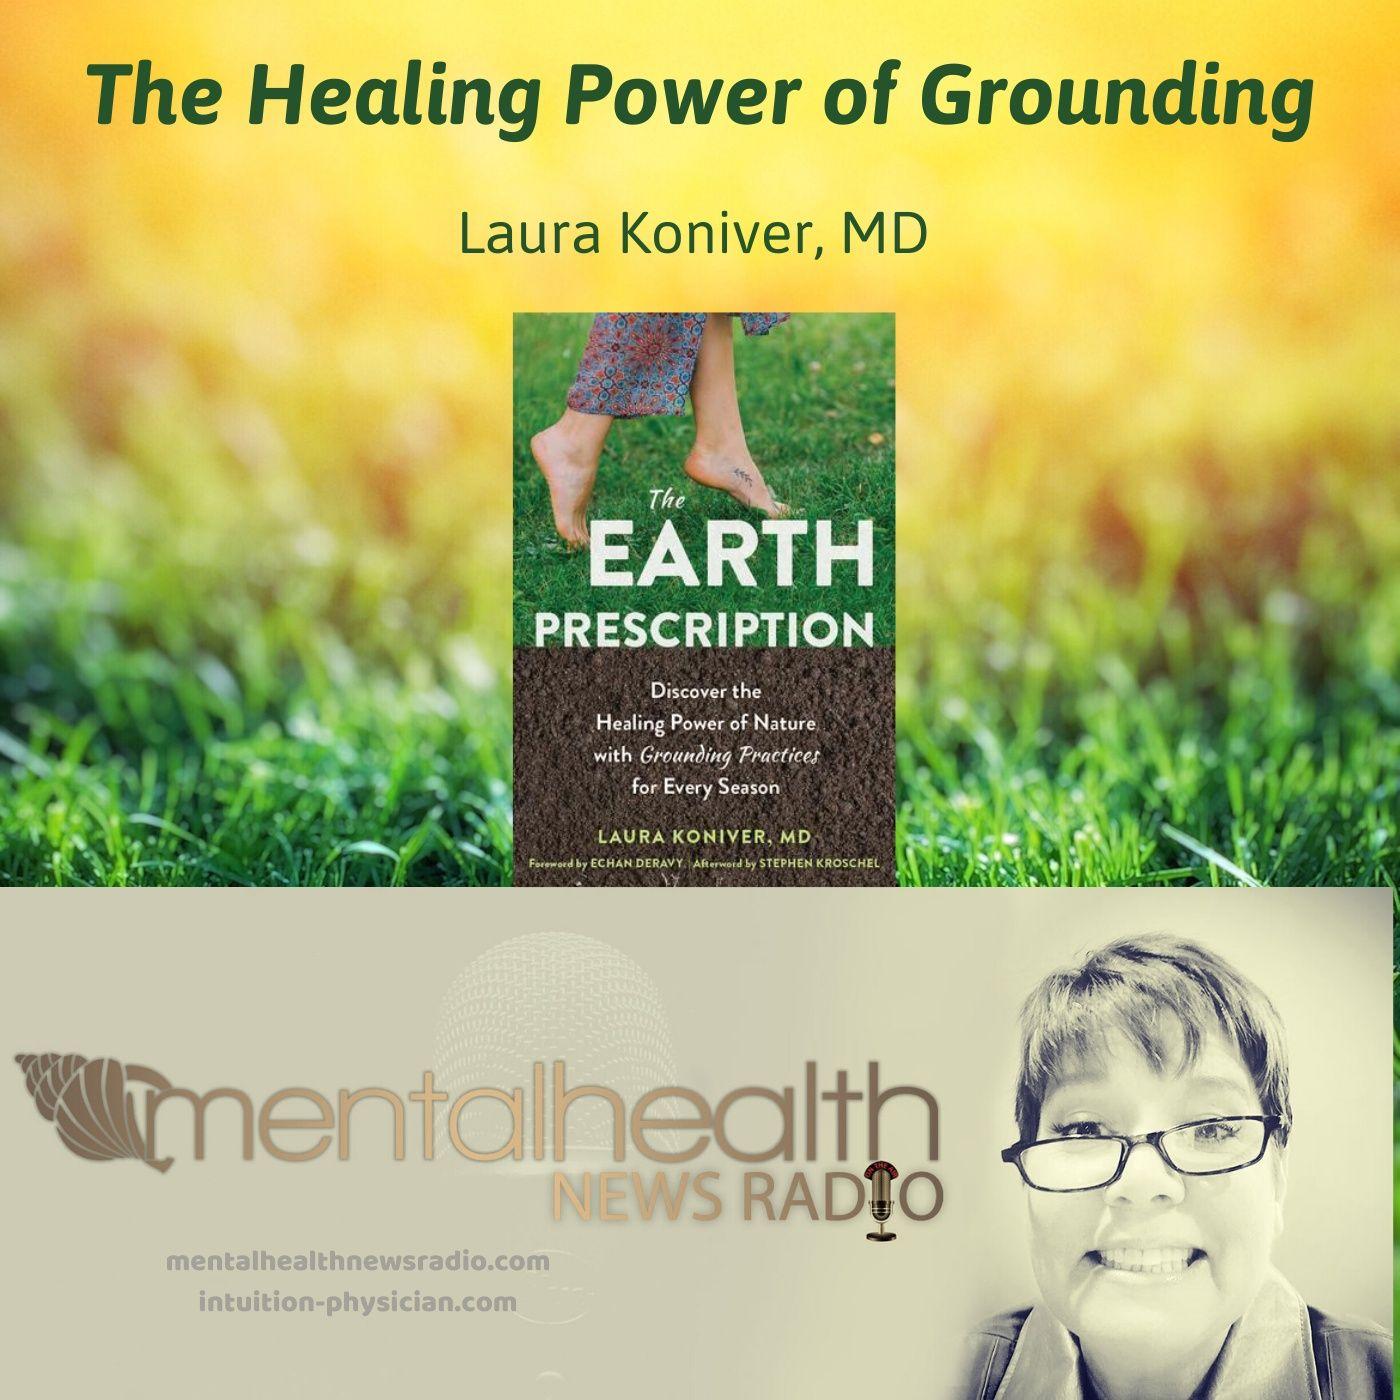 Mental Health News Radio - The Healing Power of Grounding